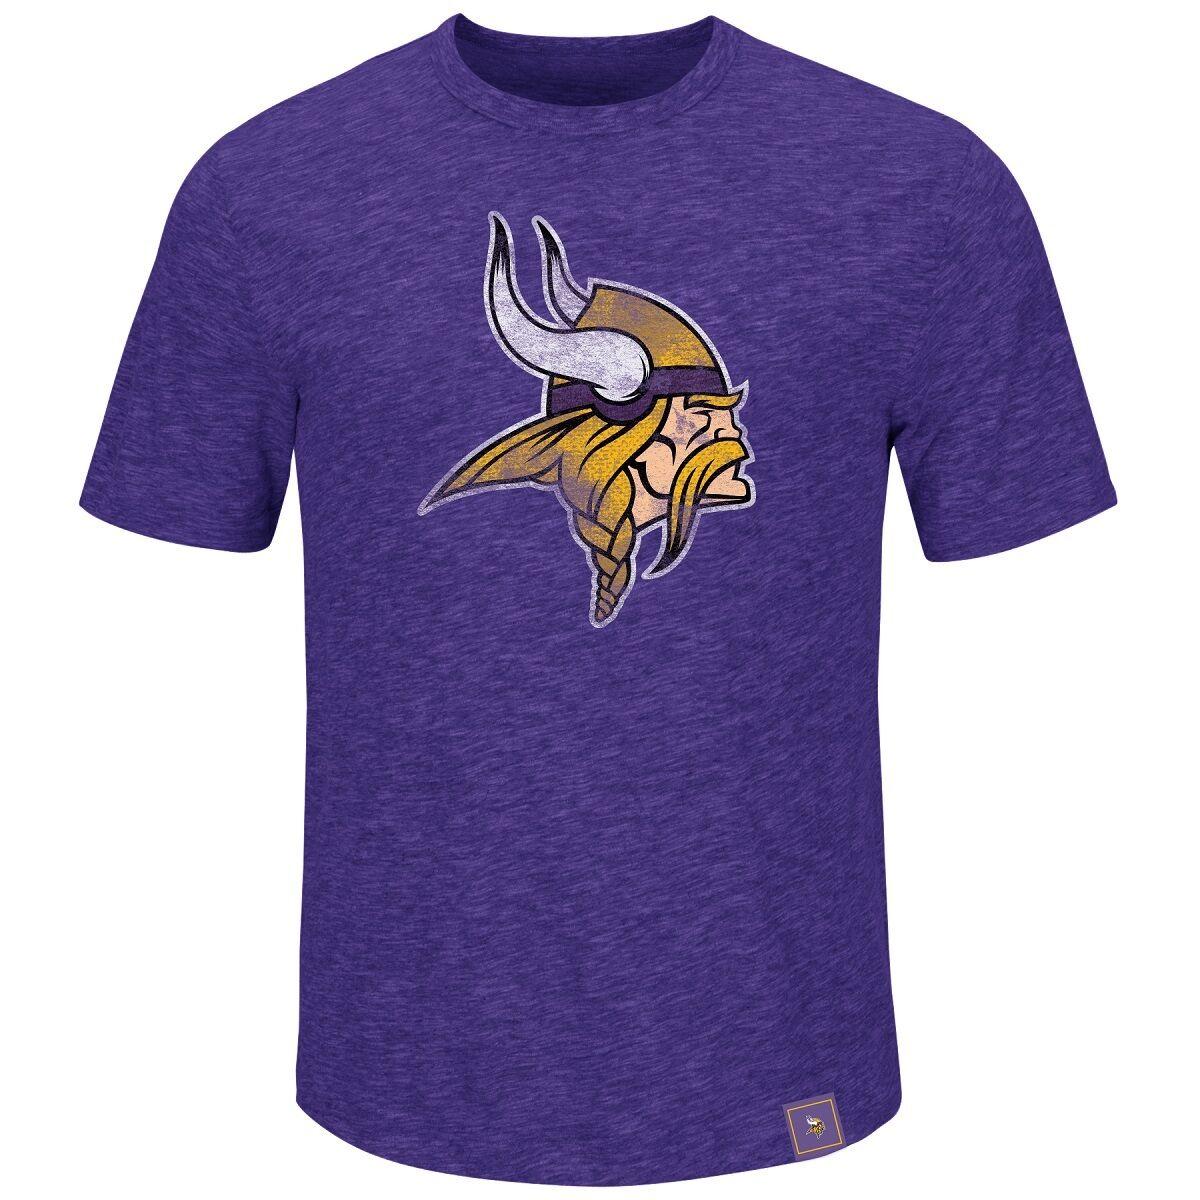 NFL Football T-Shirt T-Shirt T-Shirt MINNESOTA VIKINGS Logo Hyper Slub von Majestic 932587